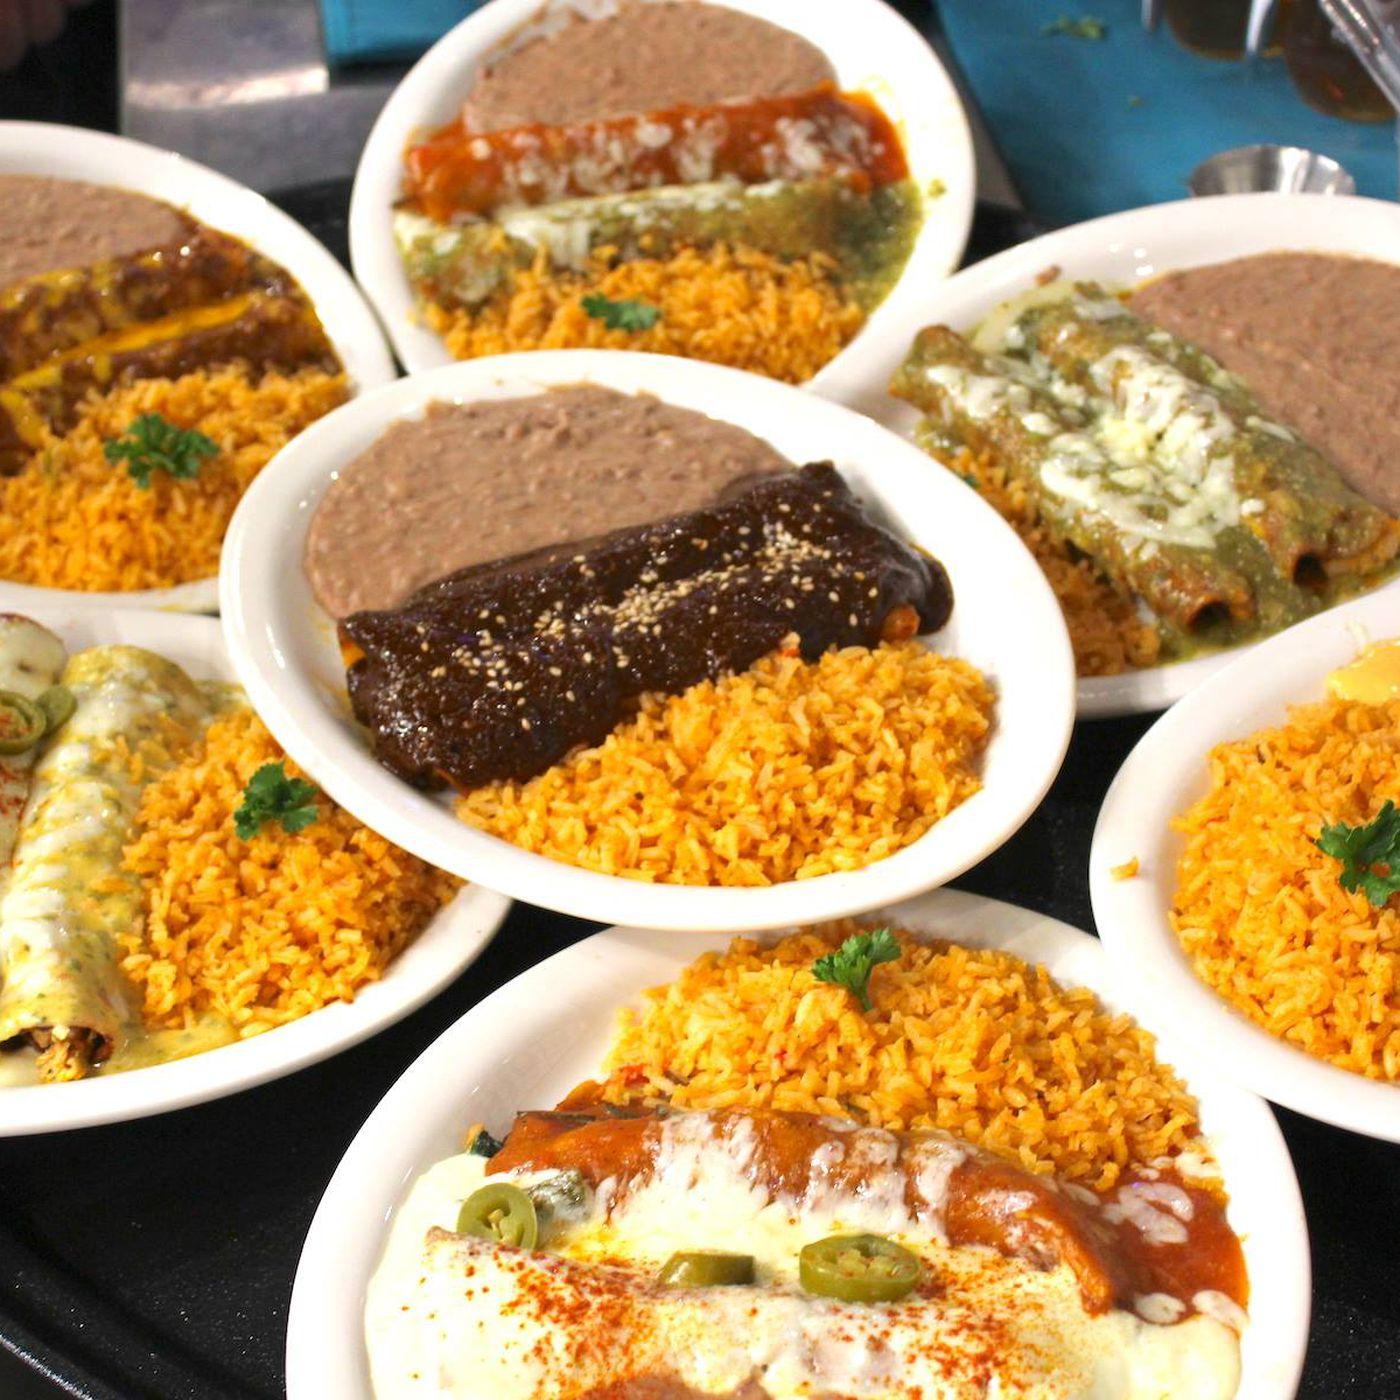 Dallas's Best Tex-Mex: Where to Eat the City's Best Enchiladas, Fajitas,  and More - Eater Dallas